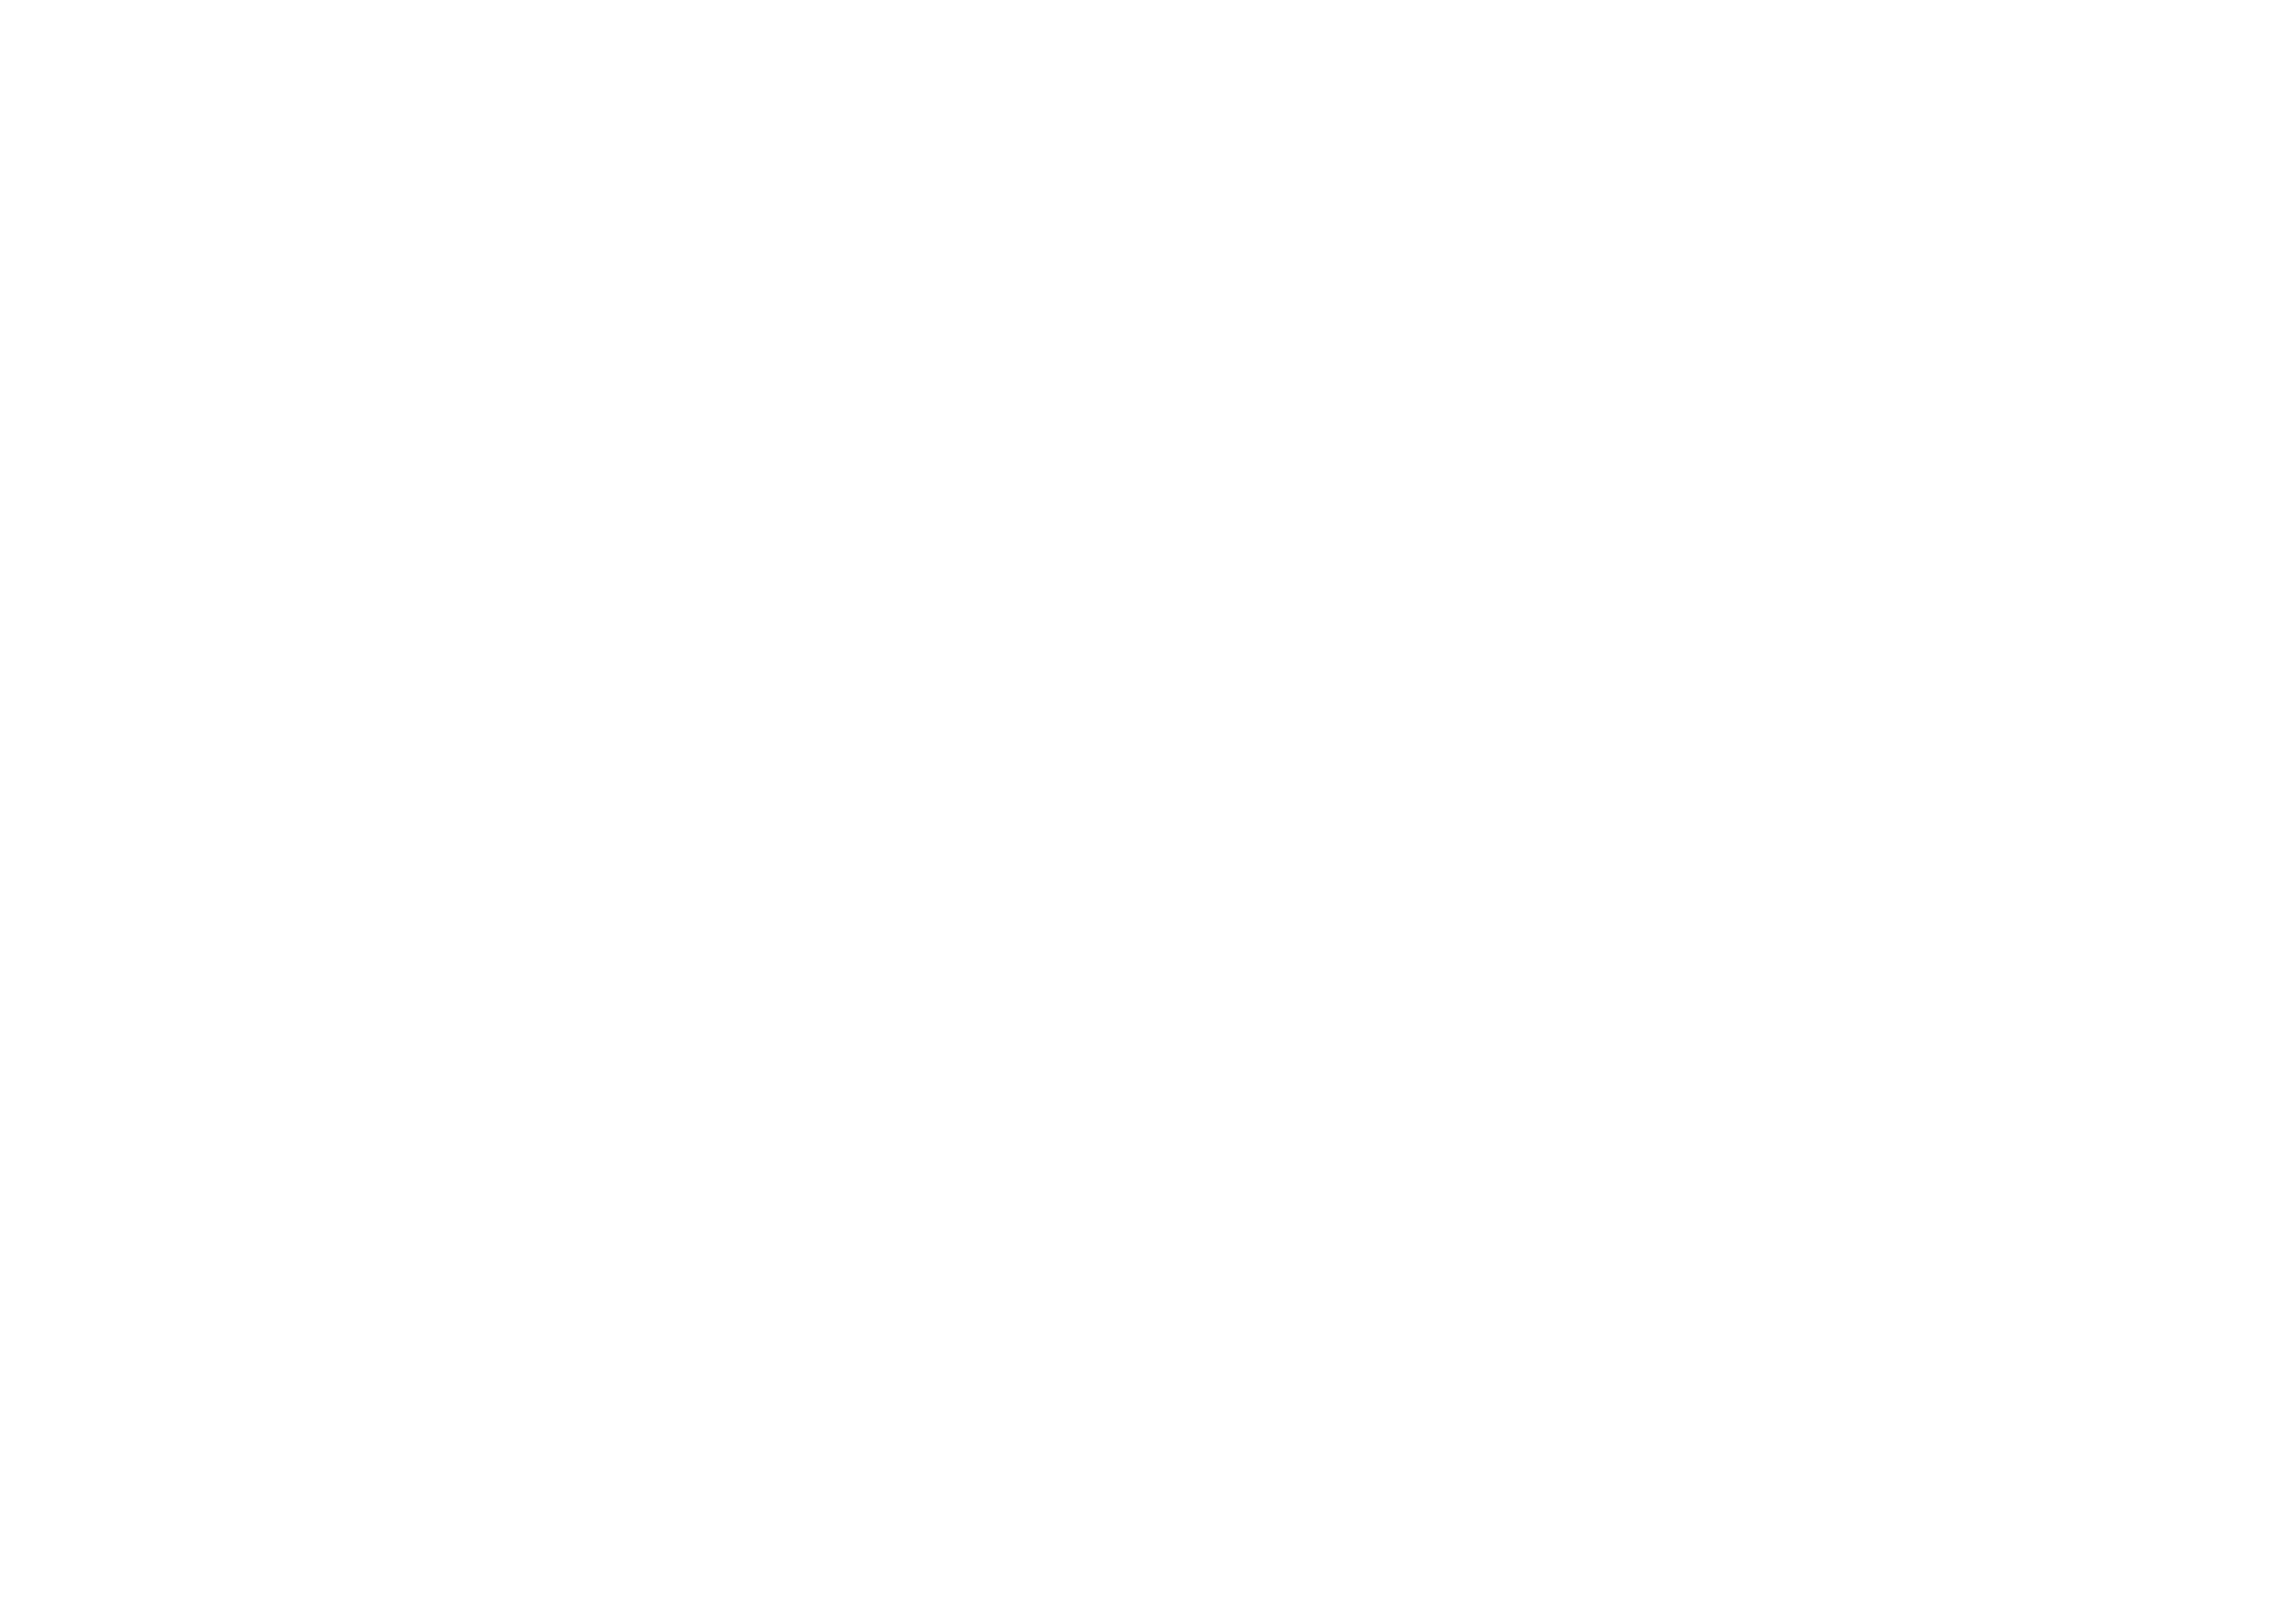 rhrc layout2-02.png